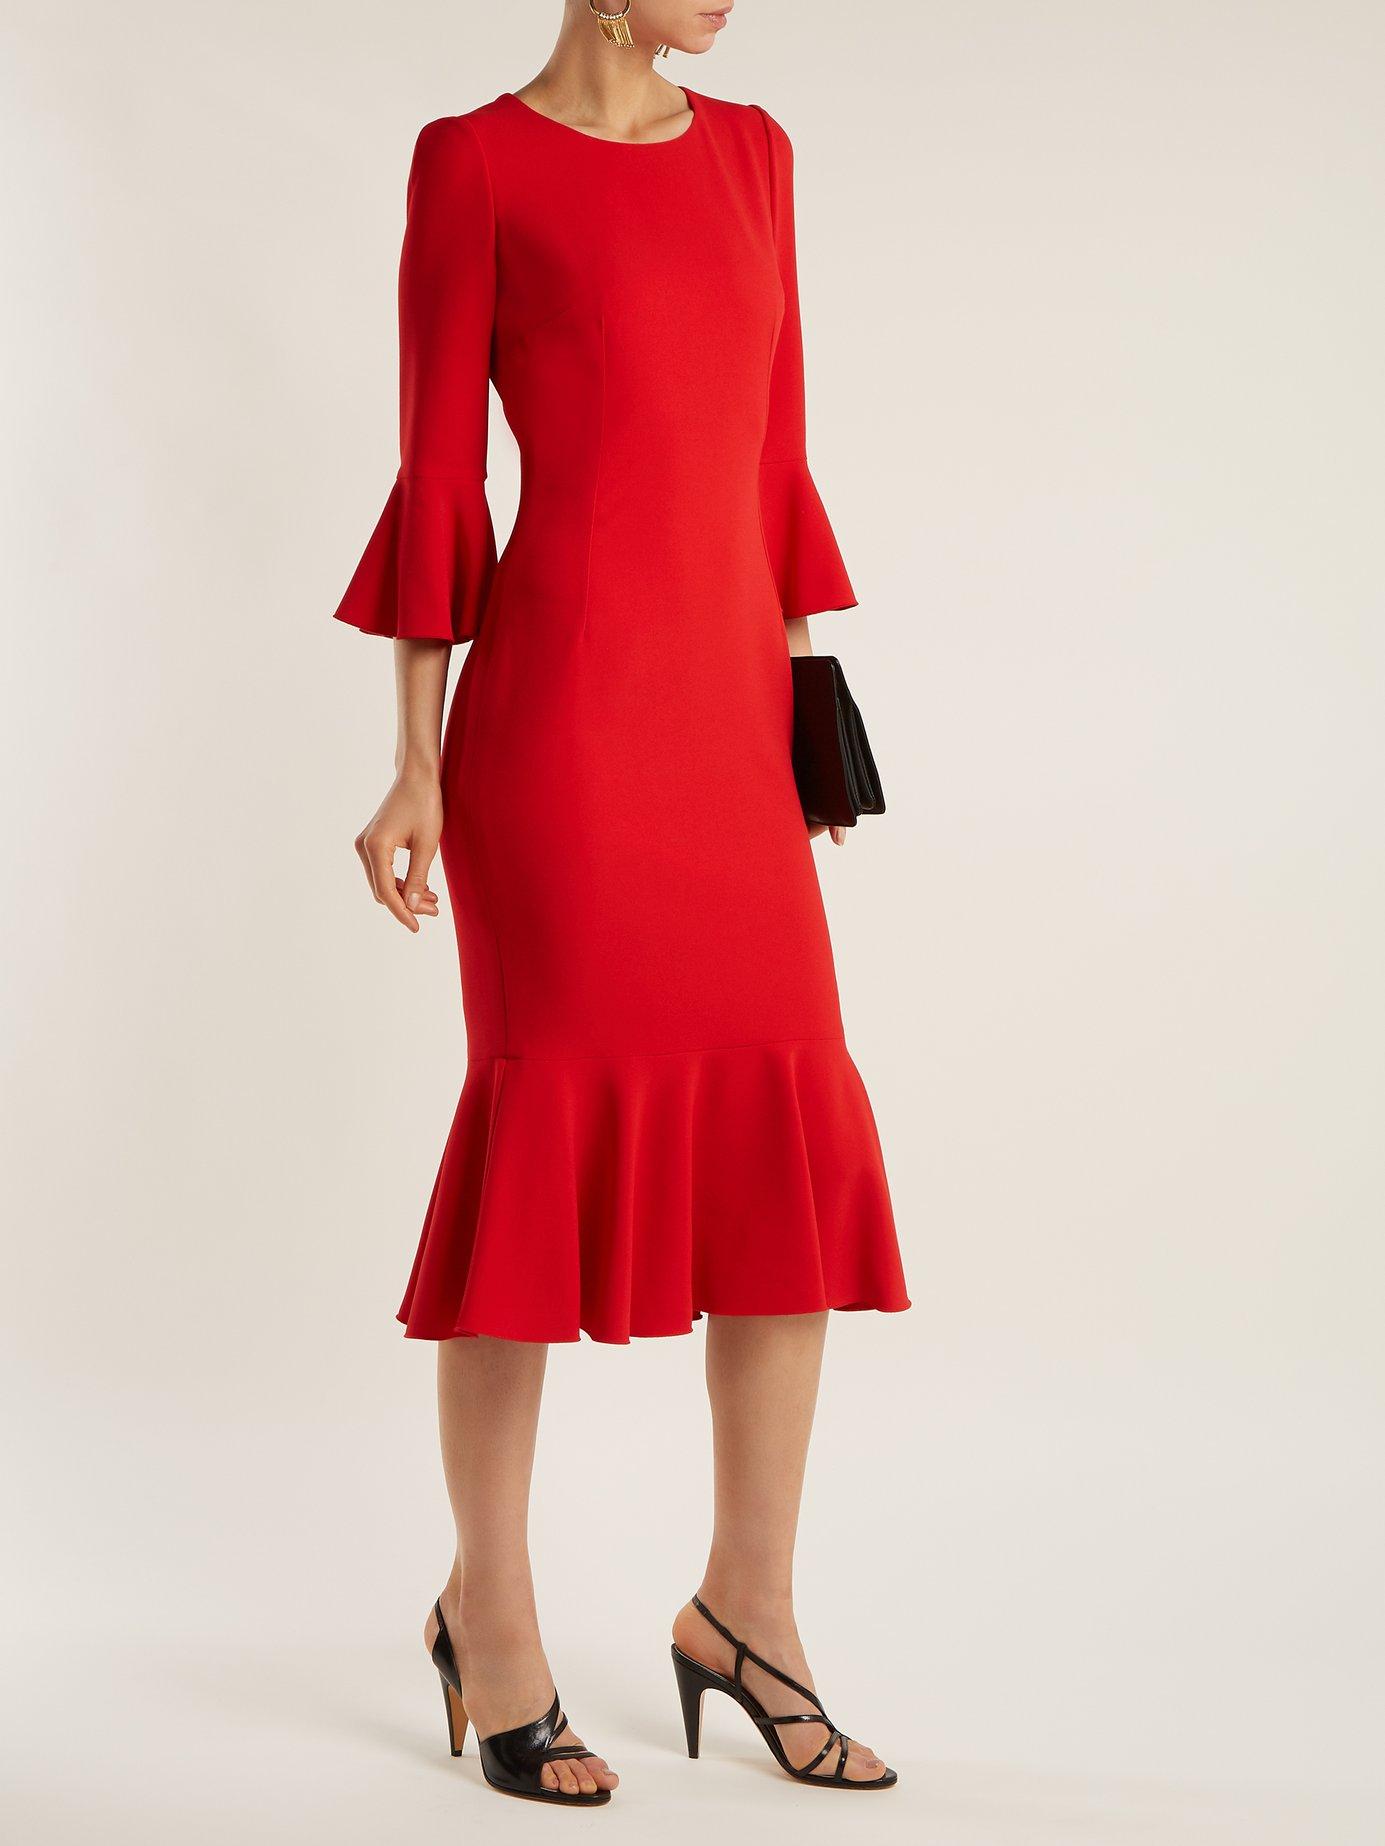 Fluted cady dress by Dolce & Gabbana